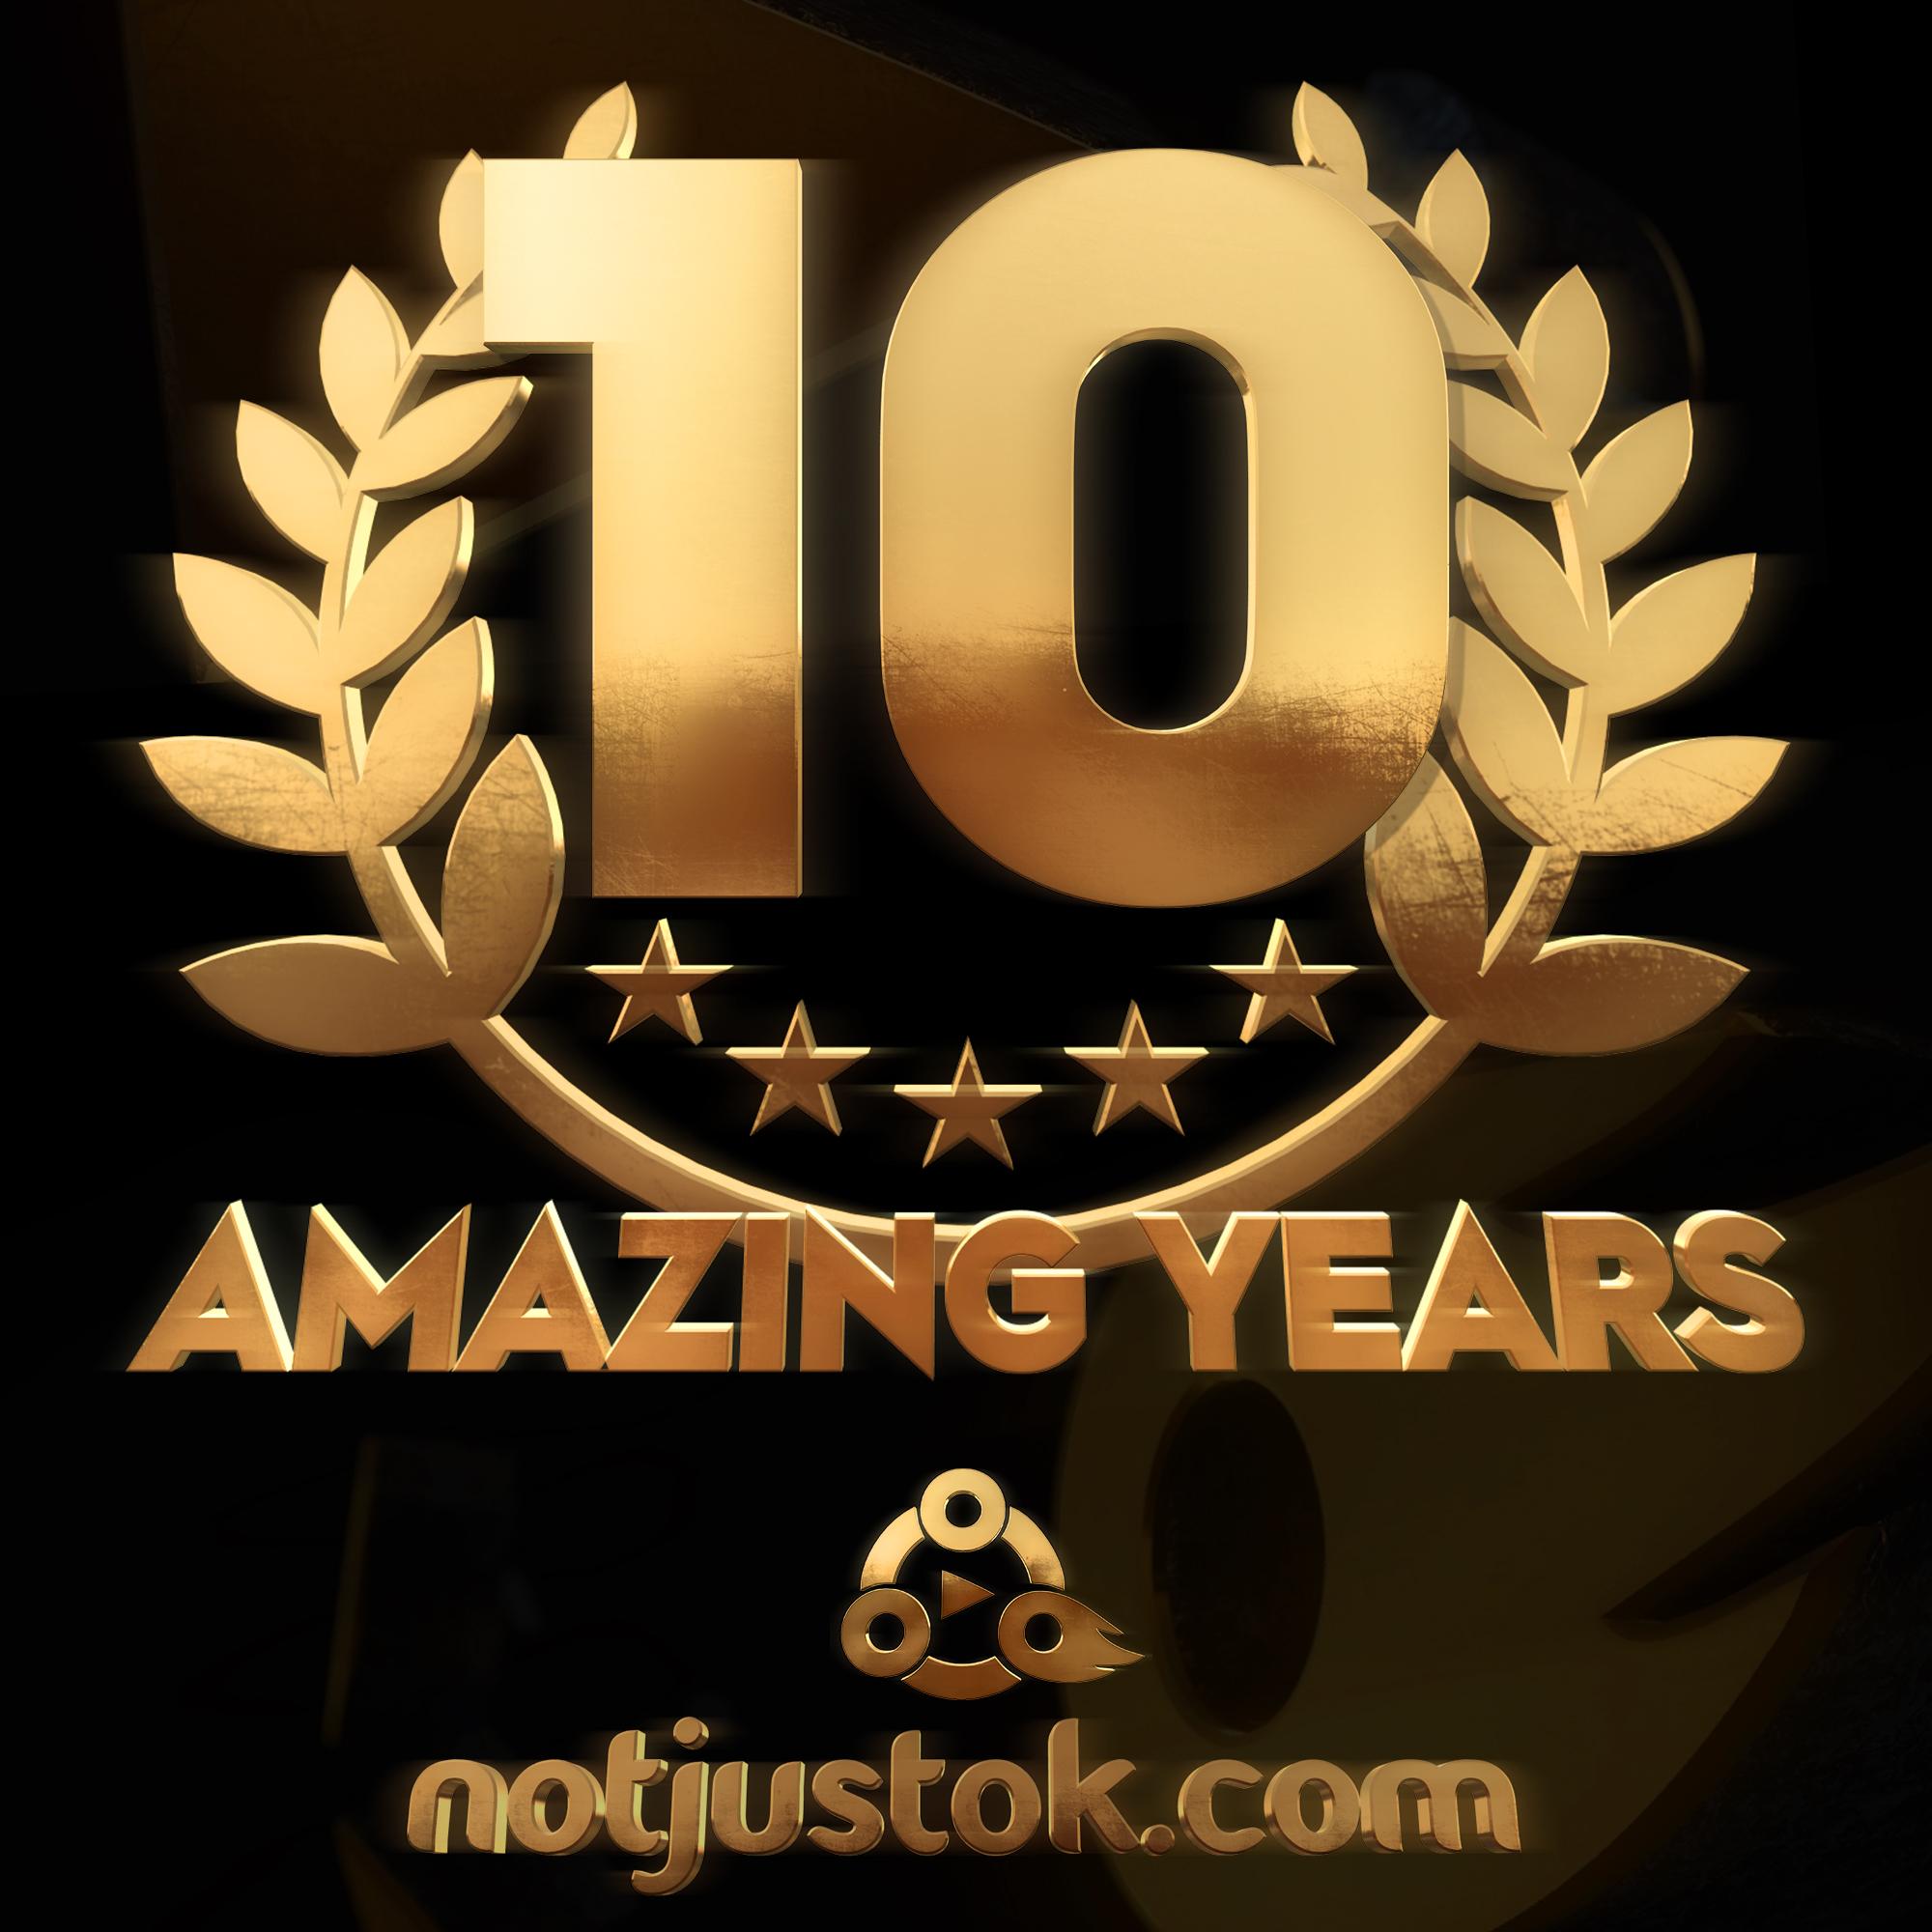 Happy 10th Anniversary, NOTJUSTOK!